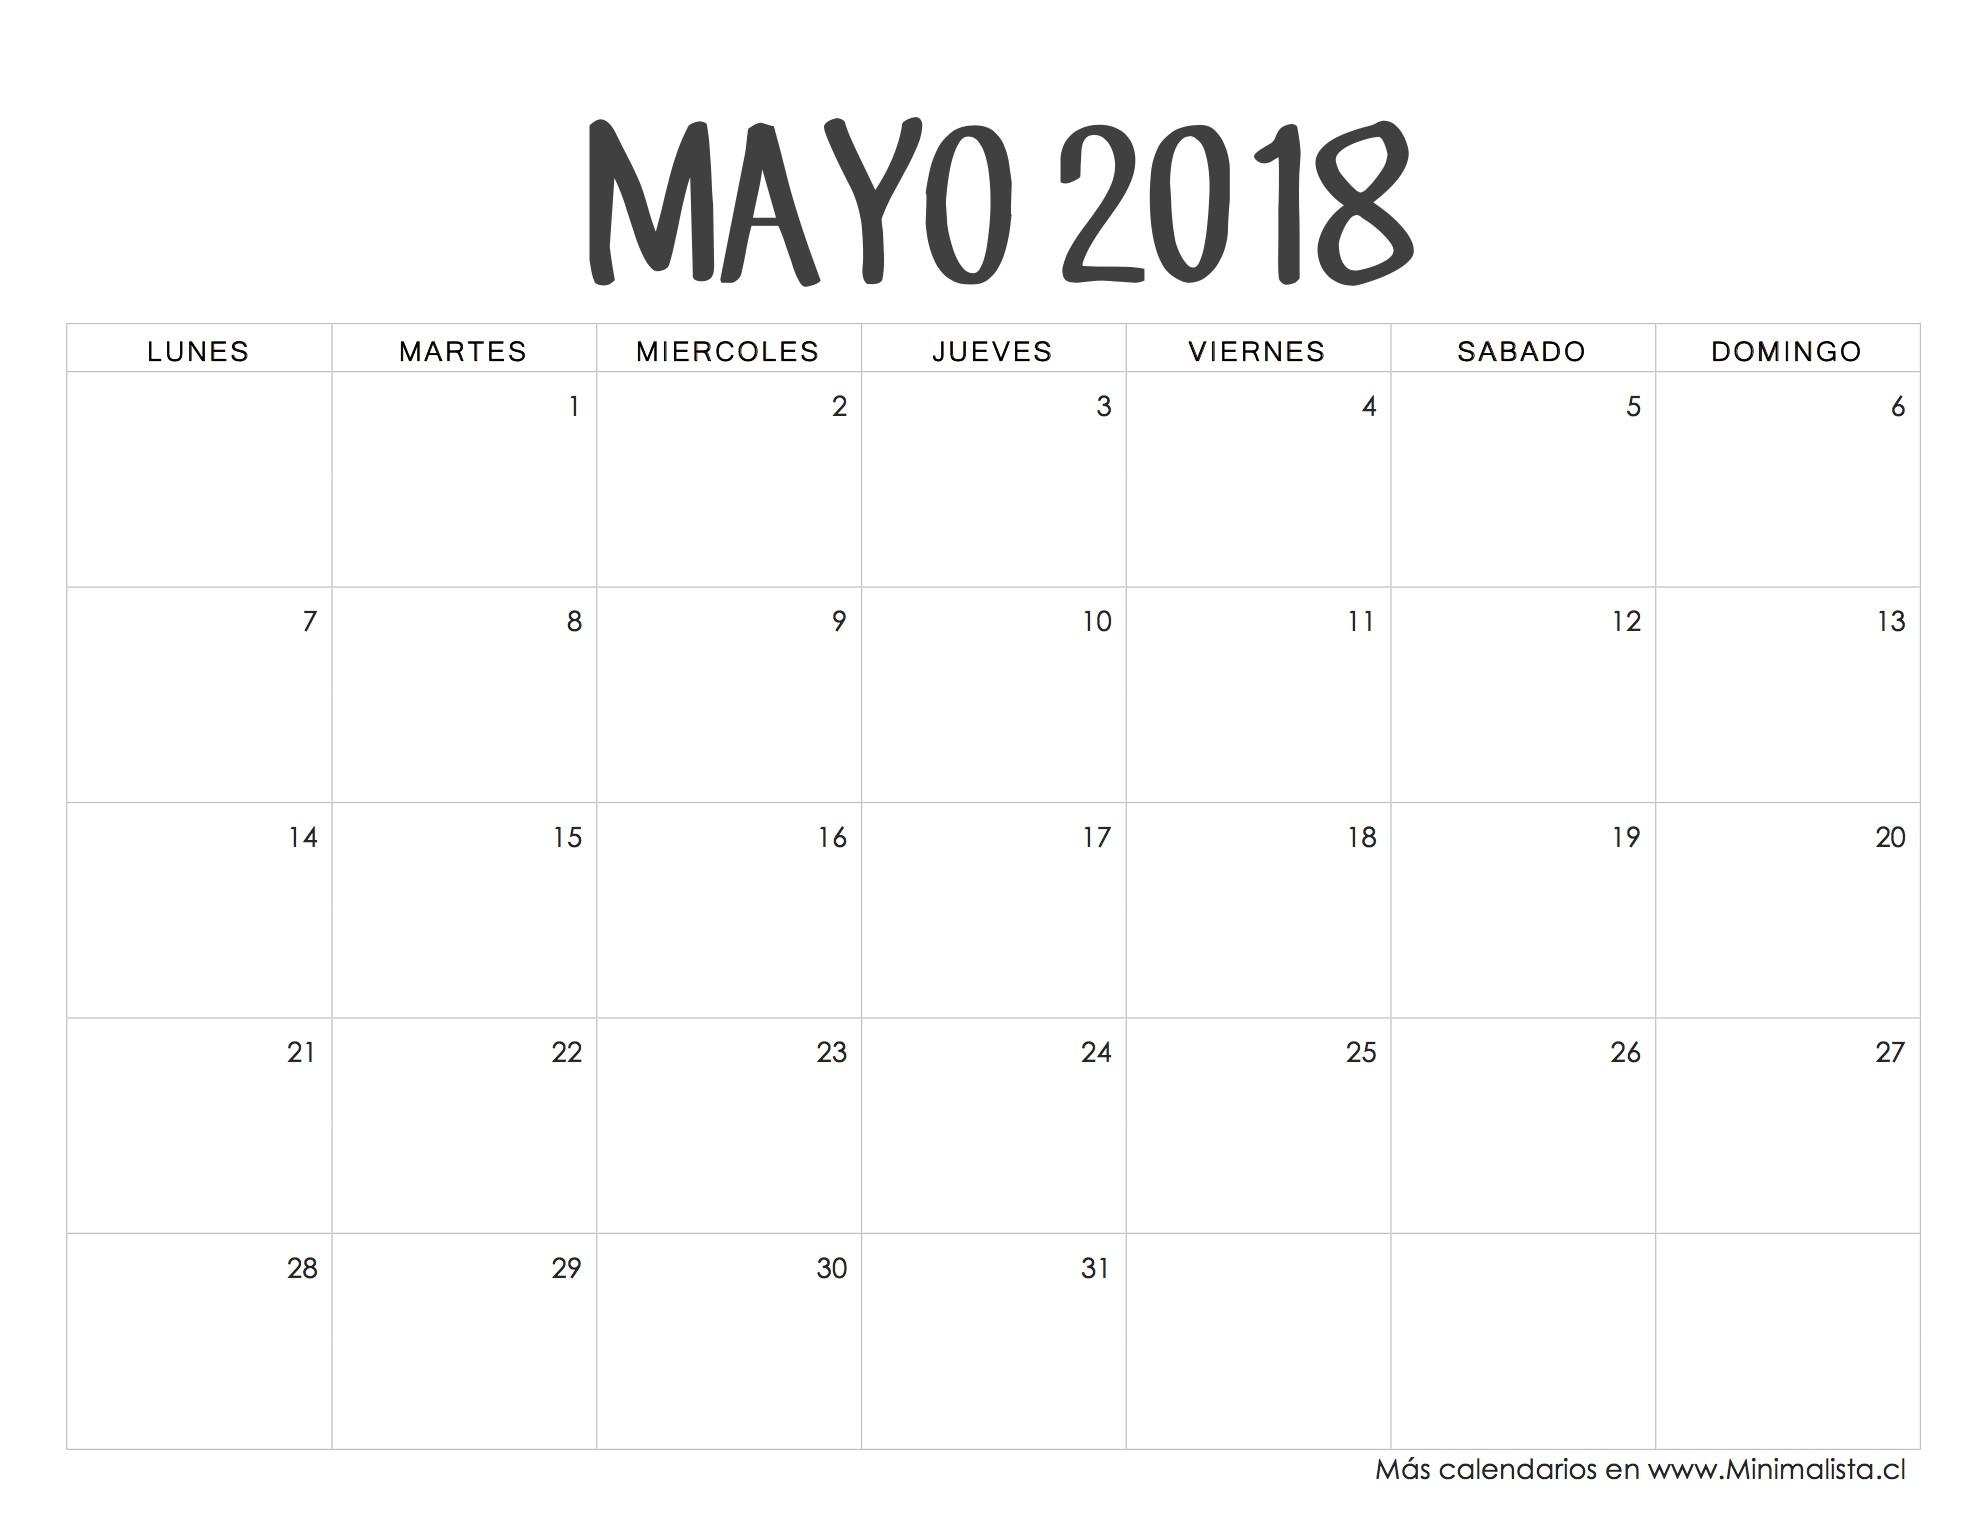 Calendarios 2018 para Imprimir Minimalista Calendario Mayo 2018